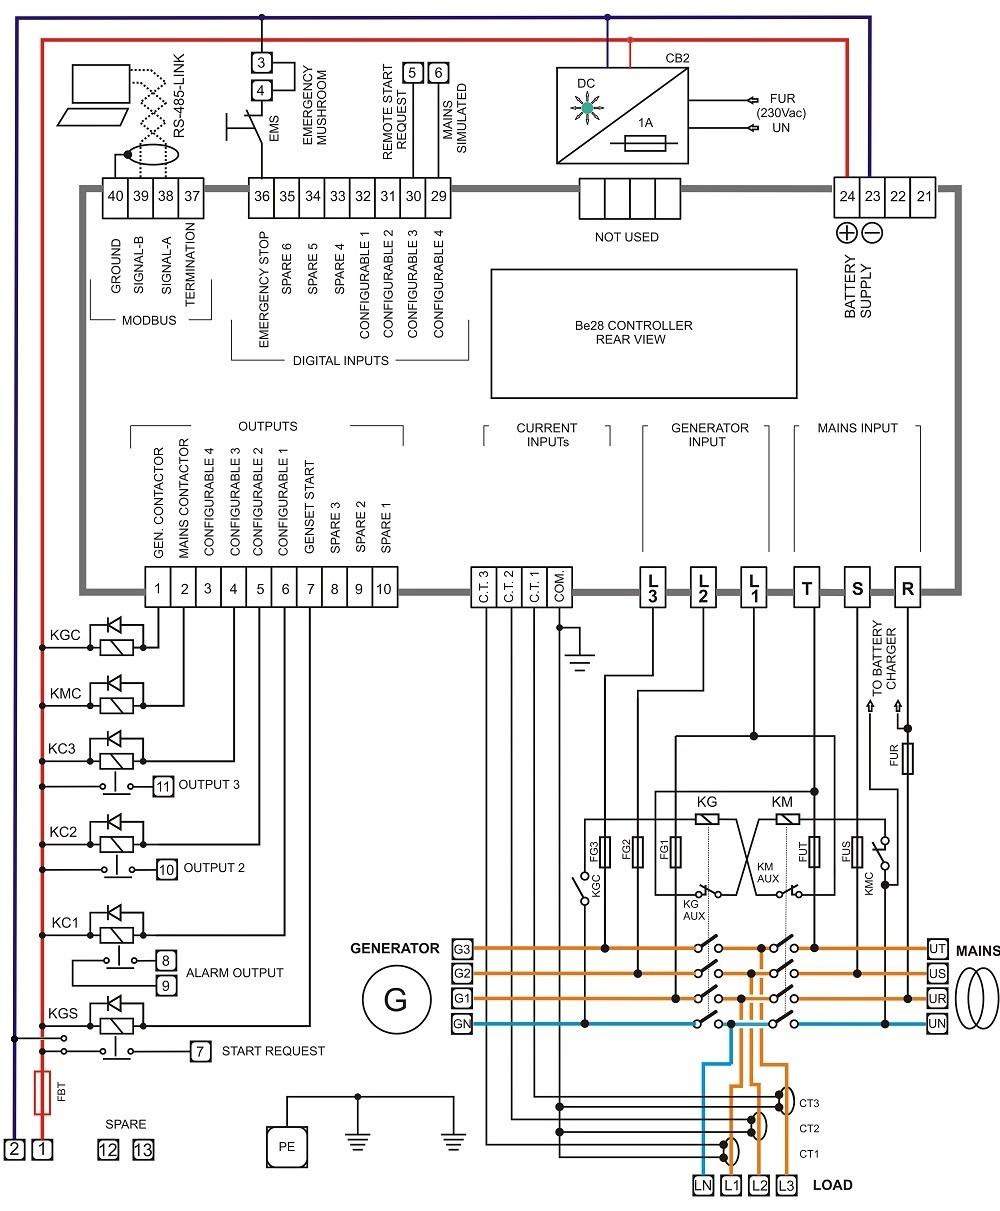 Wiring diagram remote start for 1995 audi s6 wiring diagram blog Relay Circuit Diagram Relay Switch Wiring Diagram Control Relay Wiring Diagram